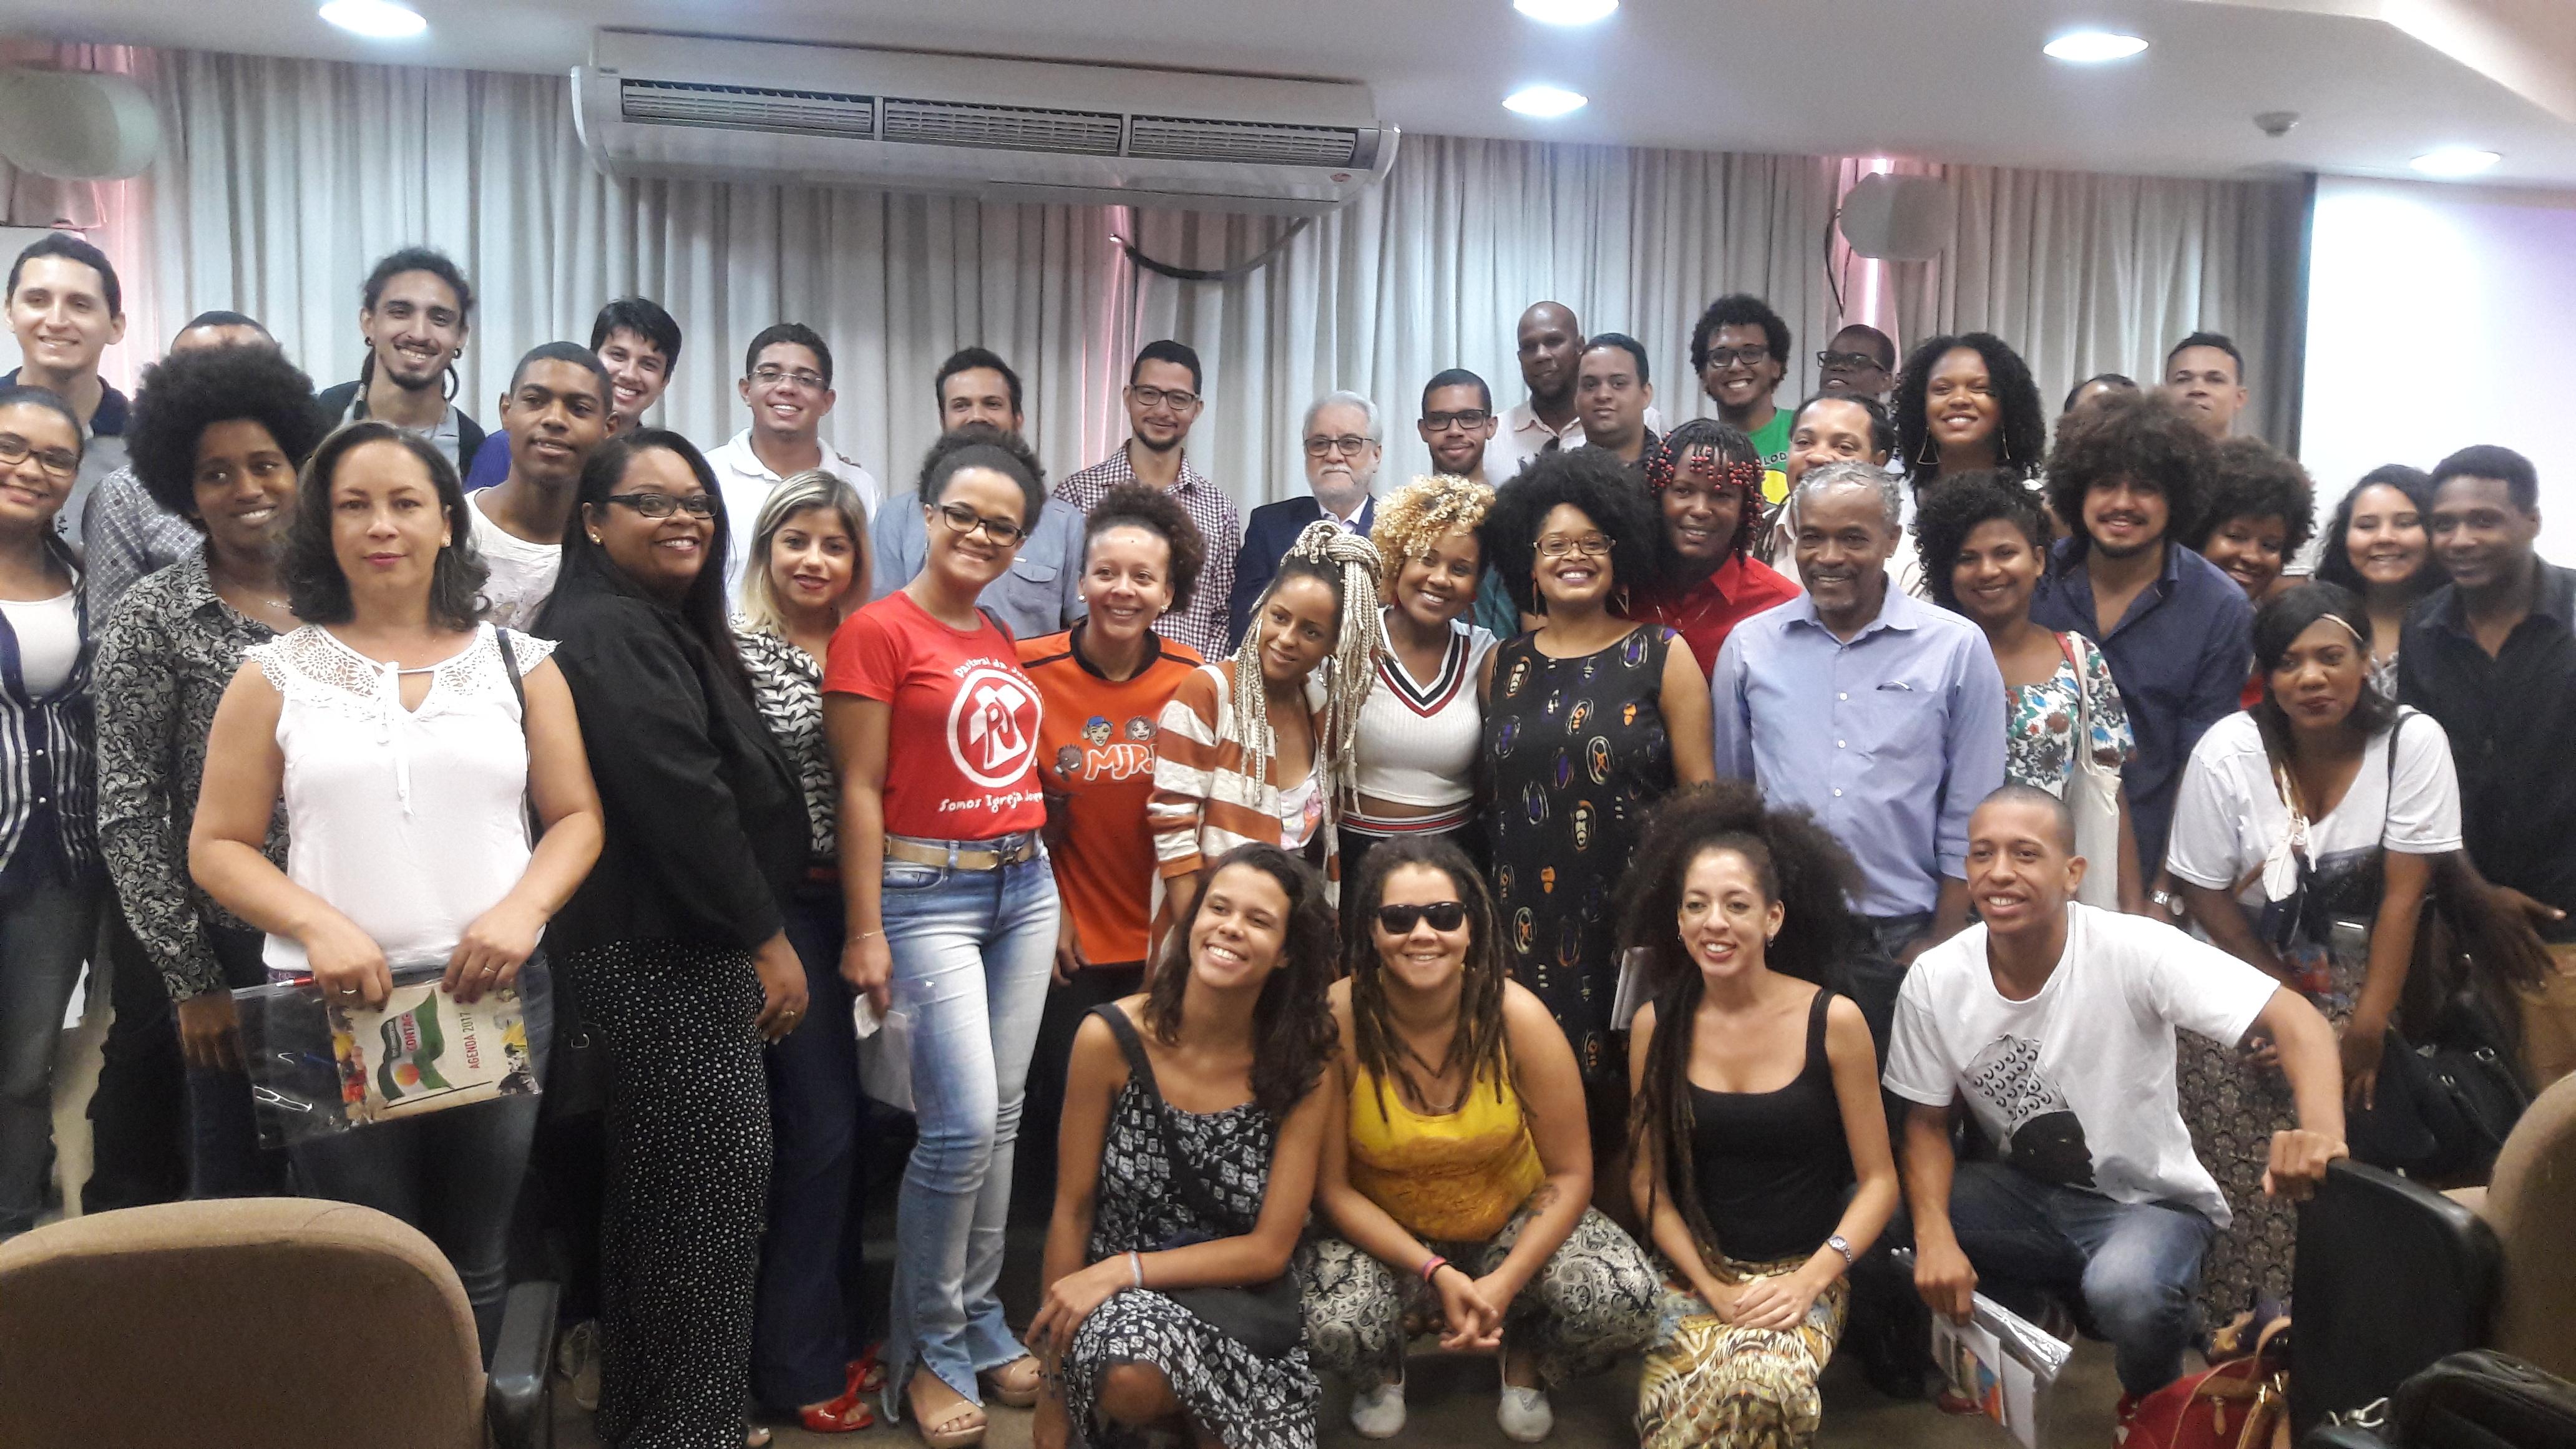 Sinttel conquista pasta no Conselho de Juventude